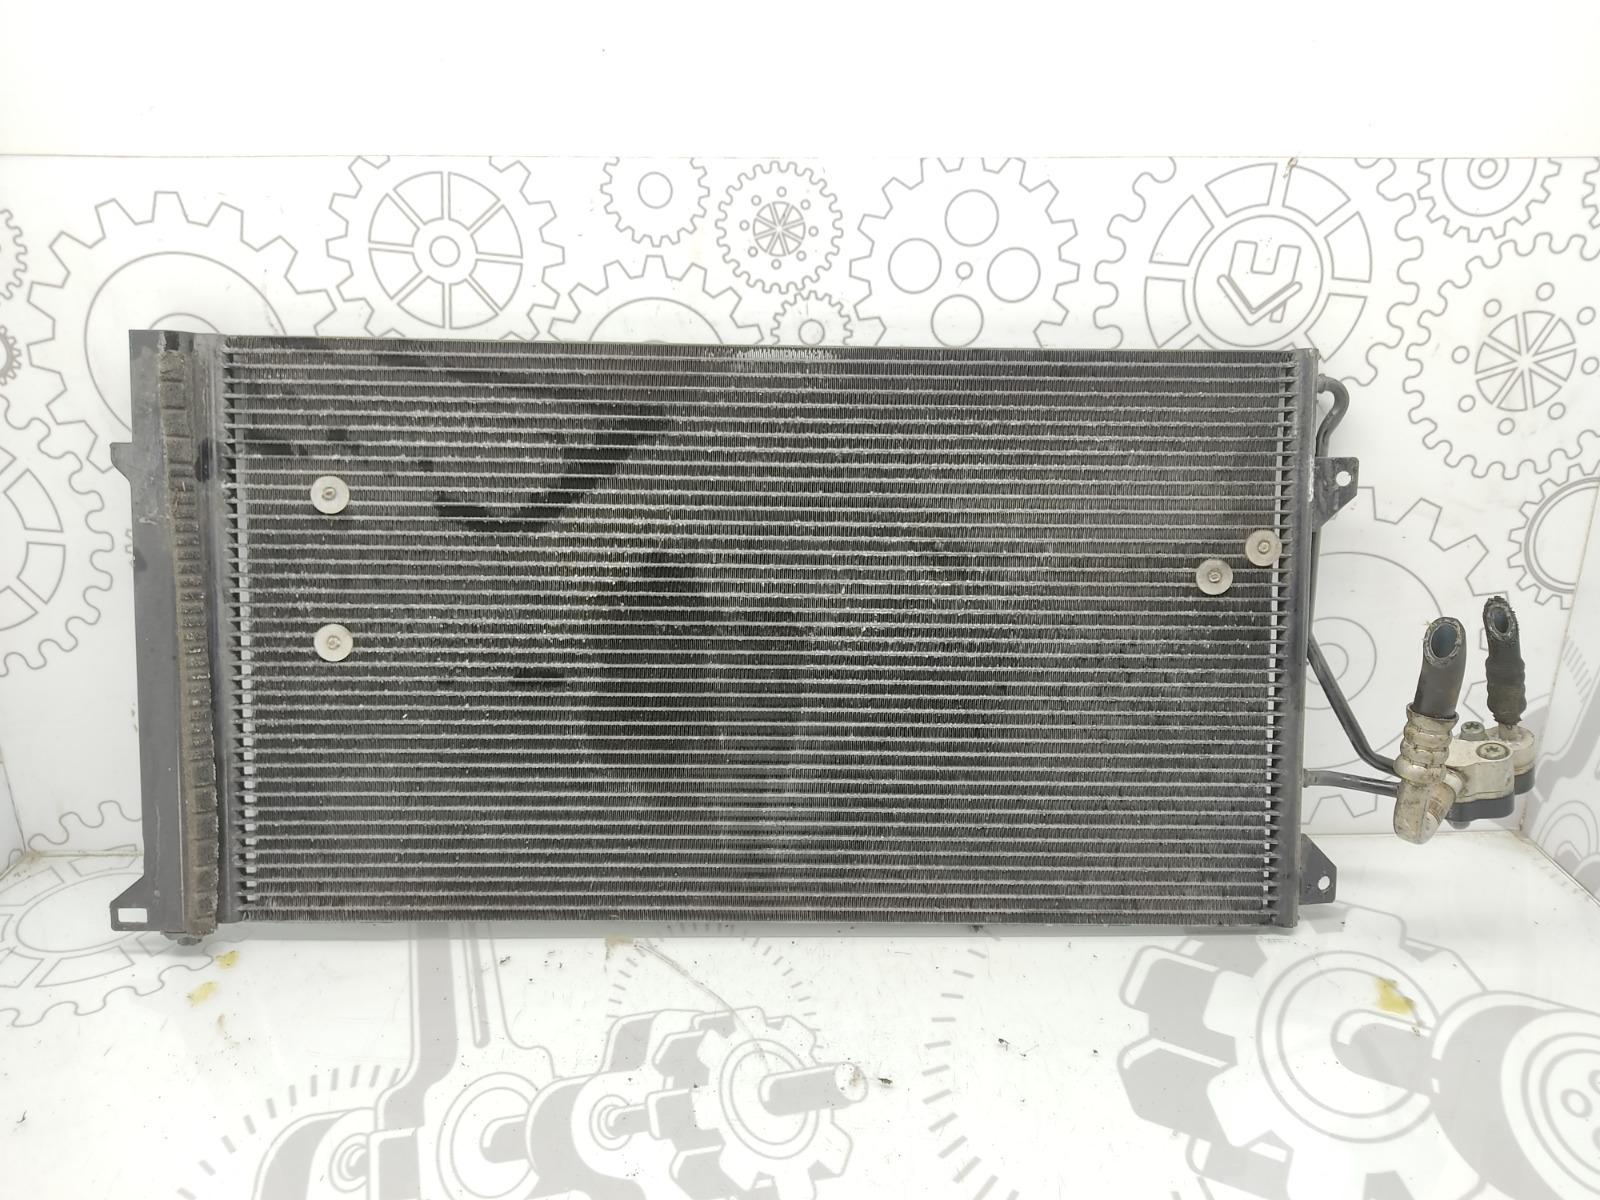 Радиатор кондиционера Porsche Cayenne 955 4.5 I 2003 (б/у)